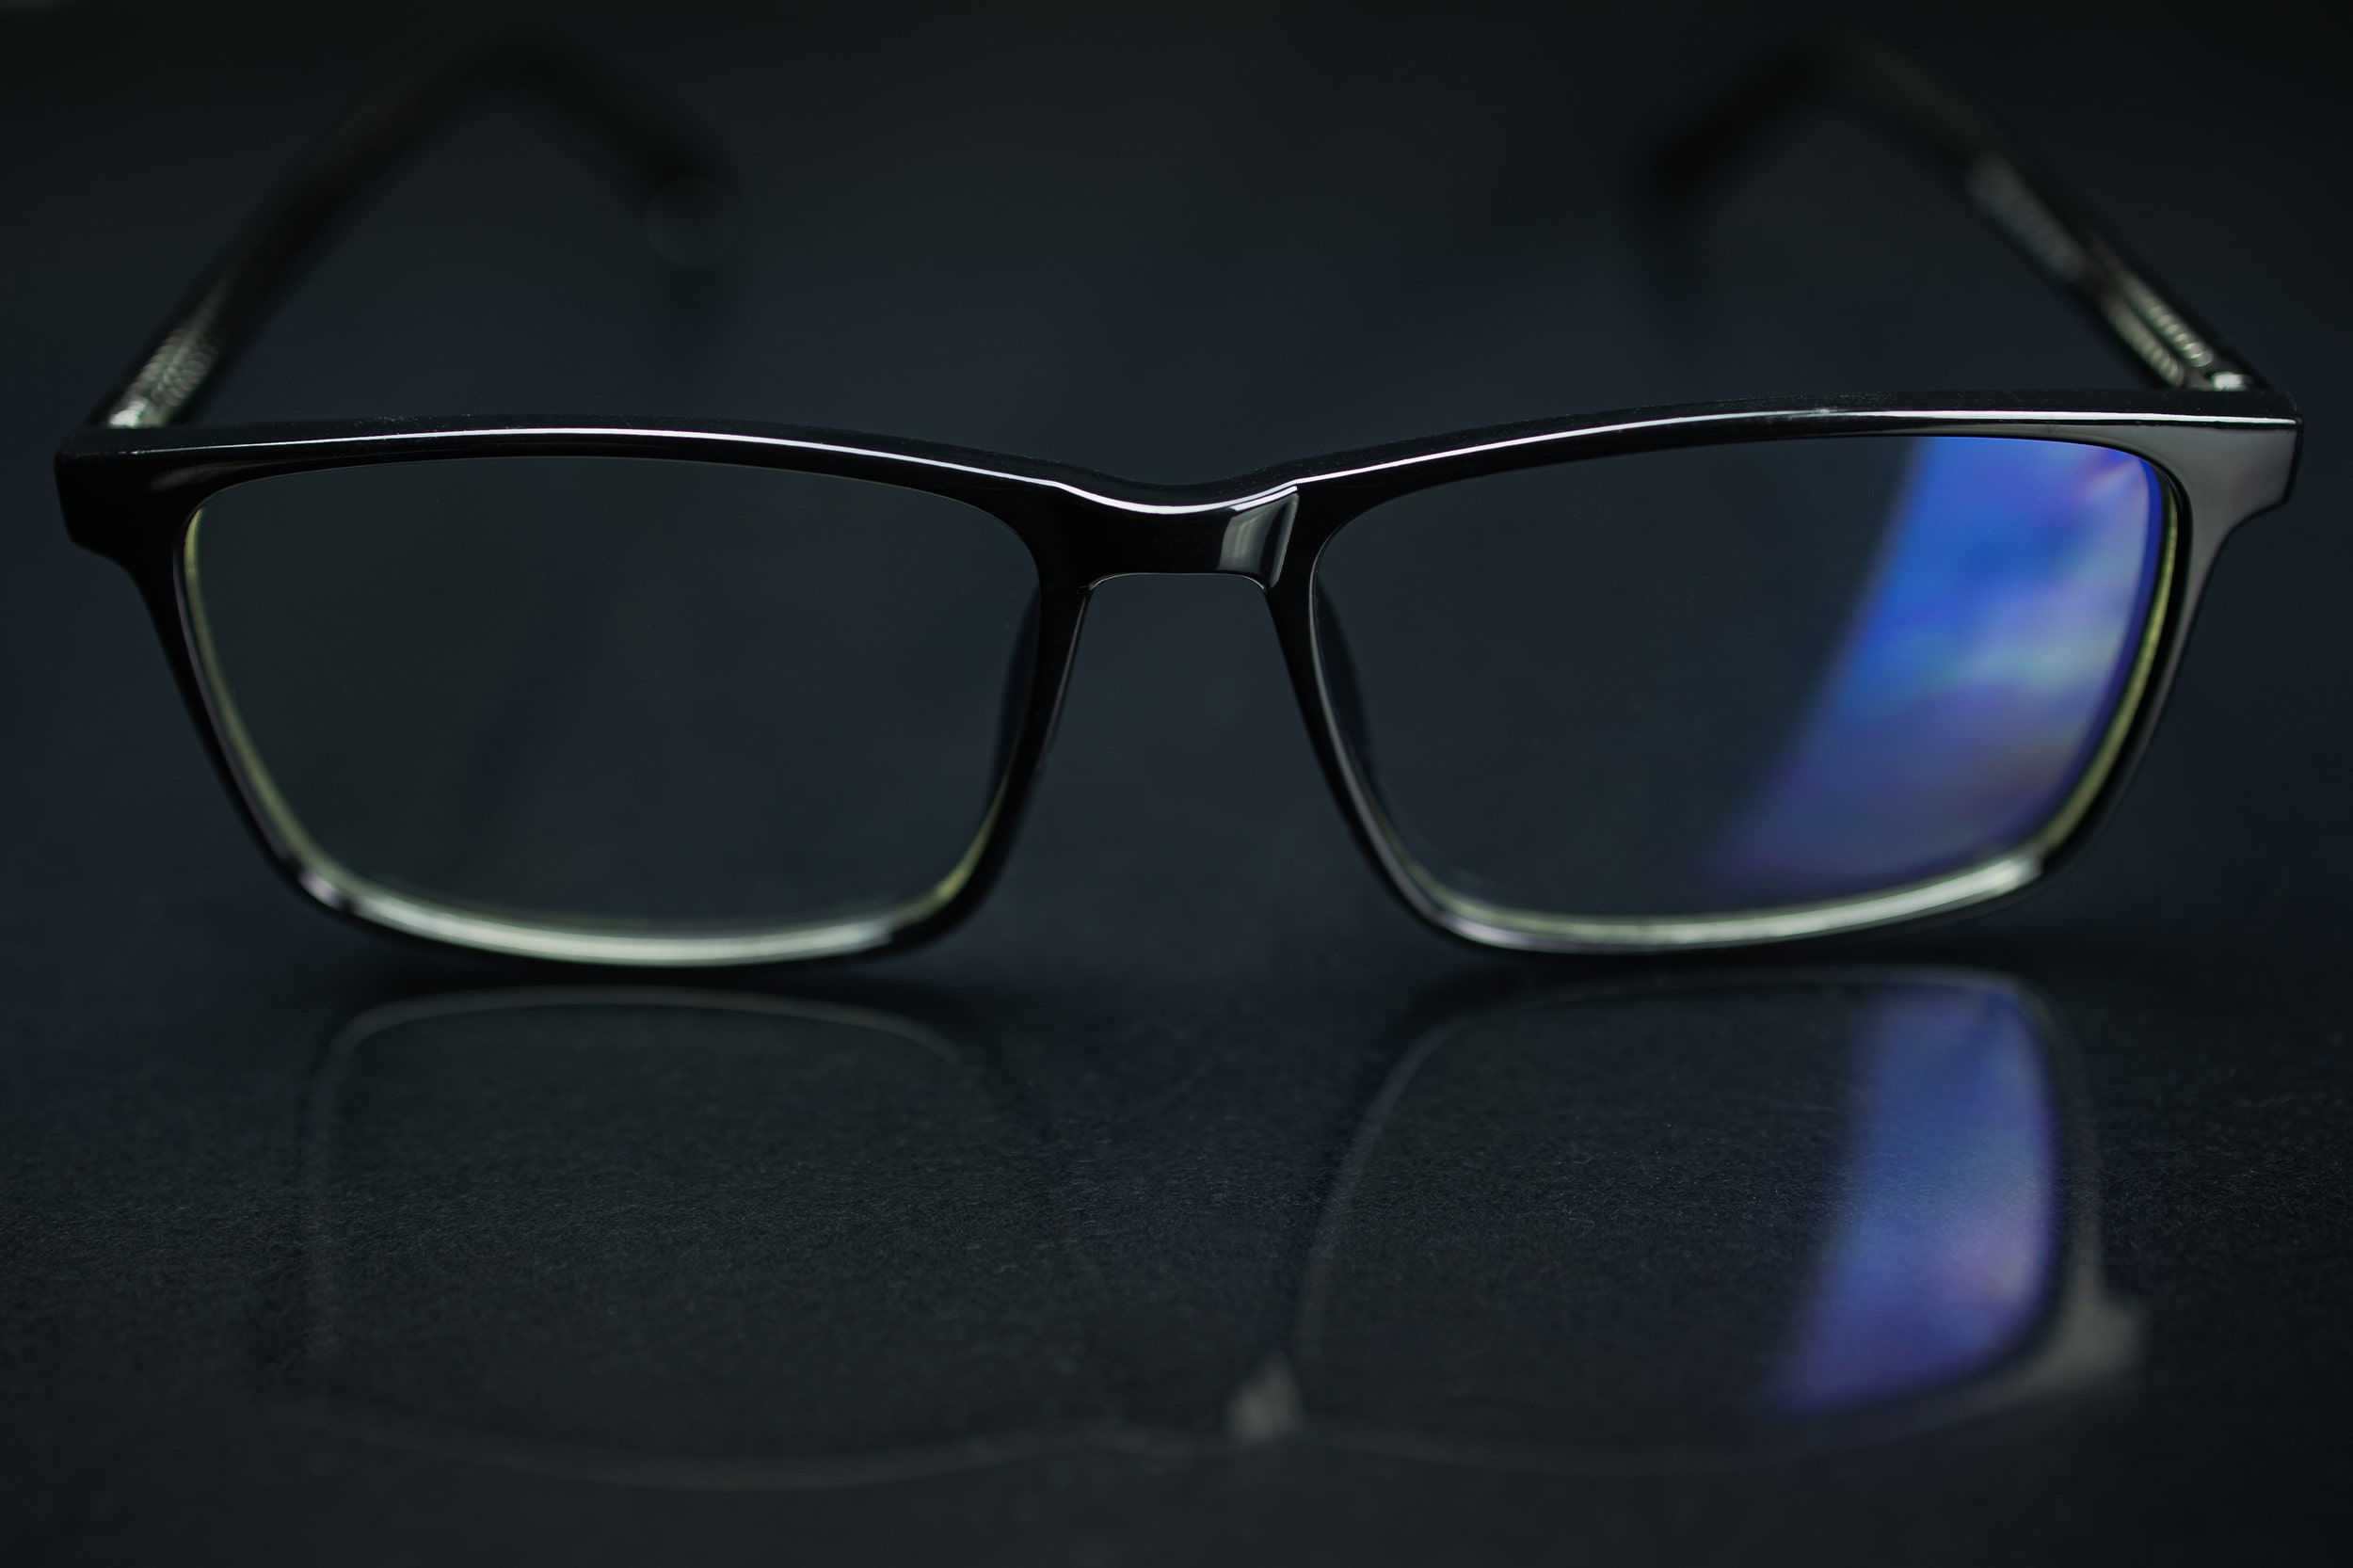 lunettes anti lumiere bleue nexilas blue shield protect